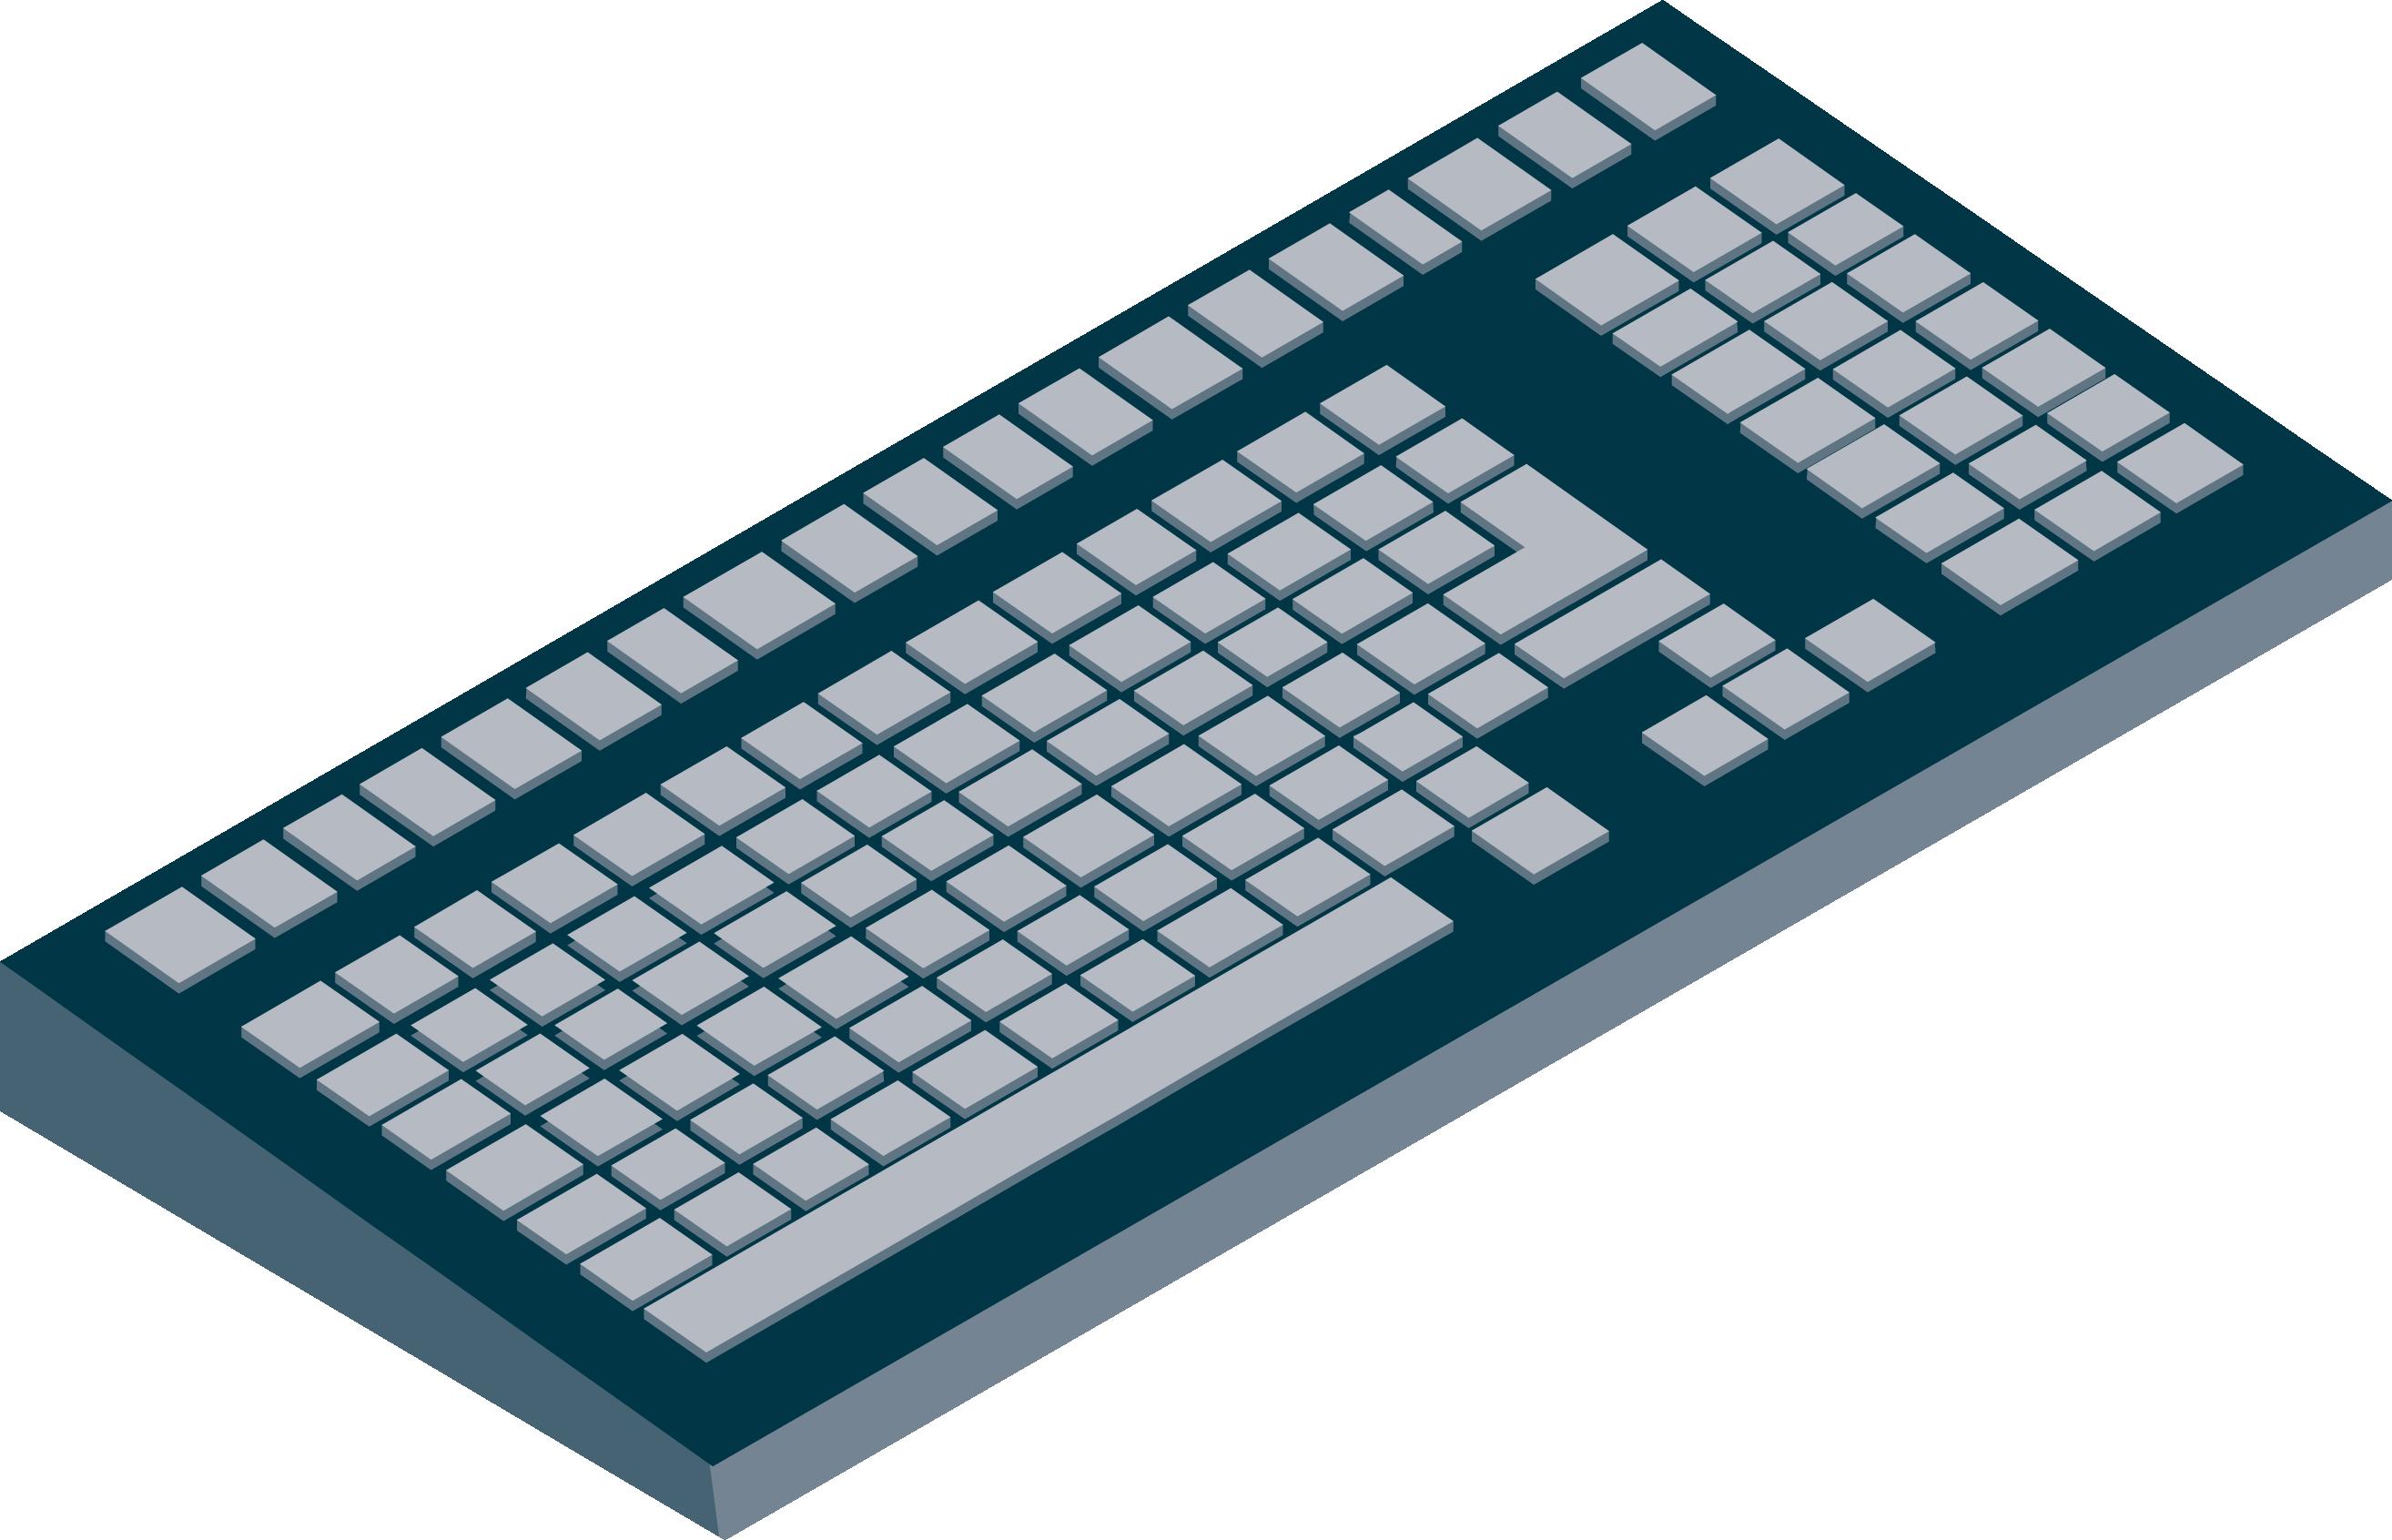 Cartoon Keyboard Png - Dell 7390 Palmrest Clipart - Full ...